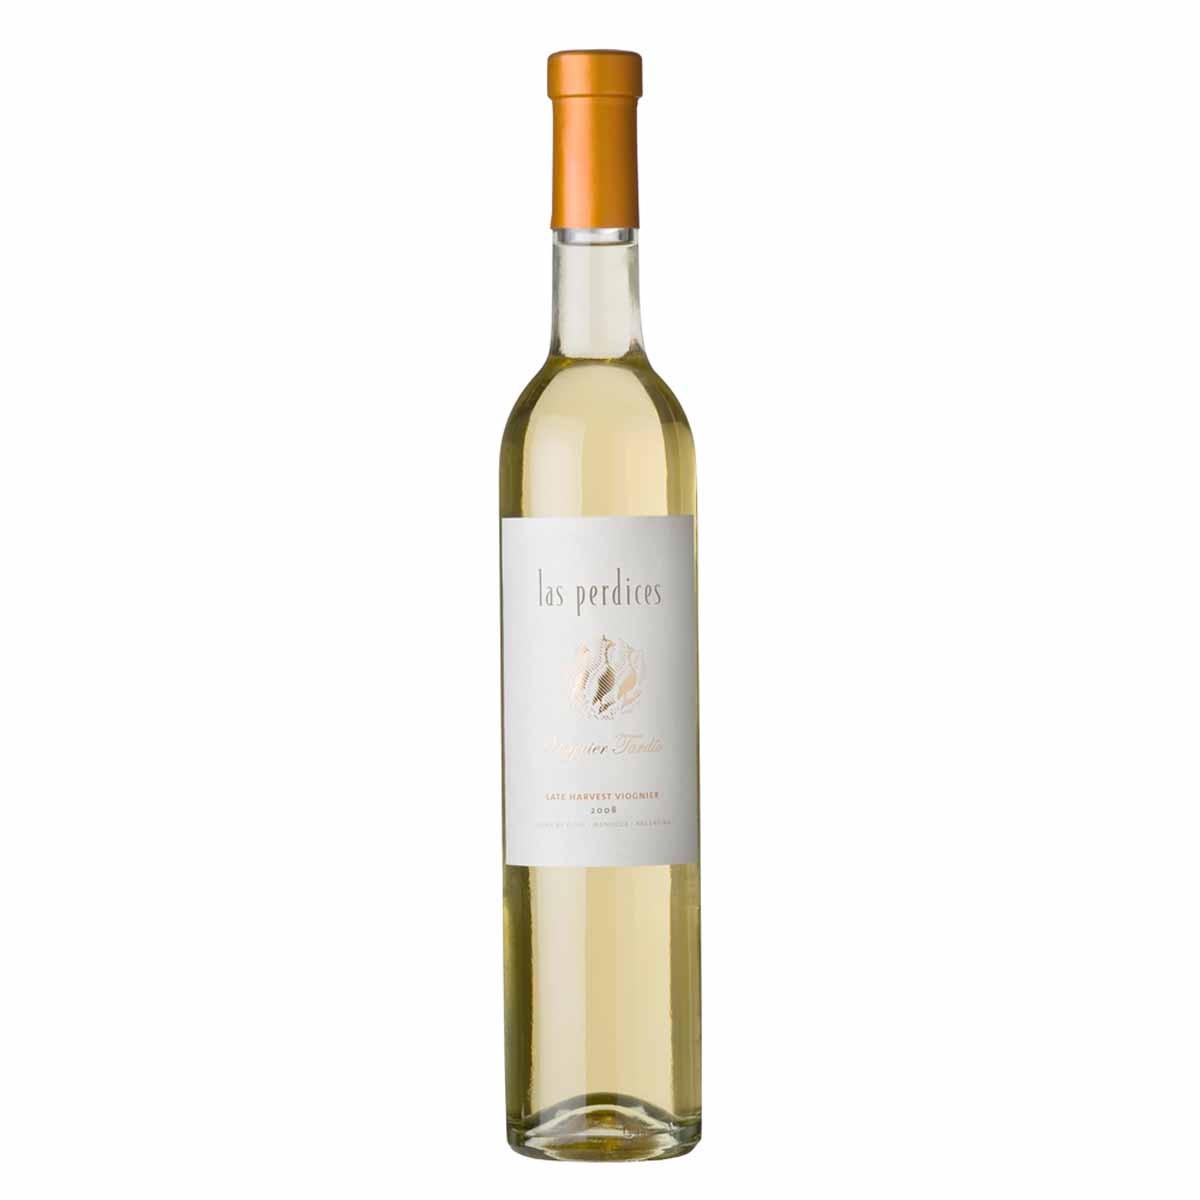 Vinho Branco Argentino Late Harvest Las Perdices Viognier 2016